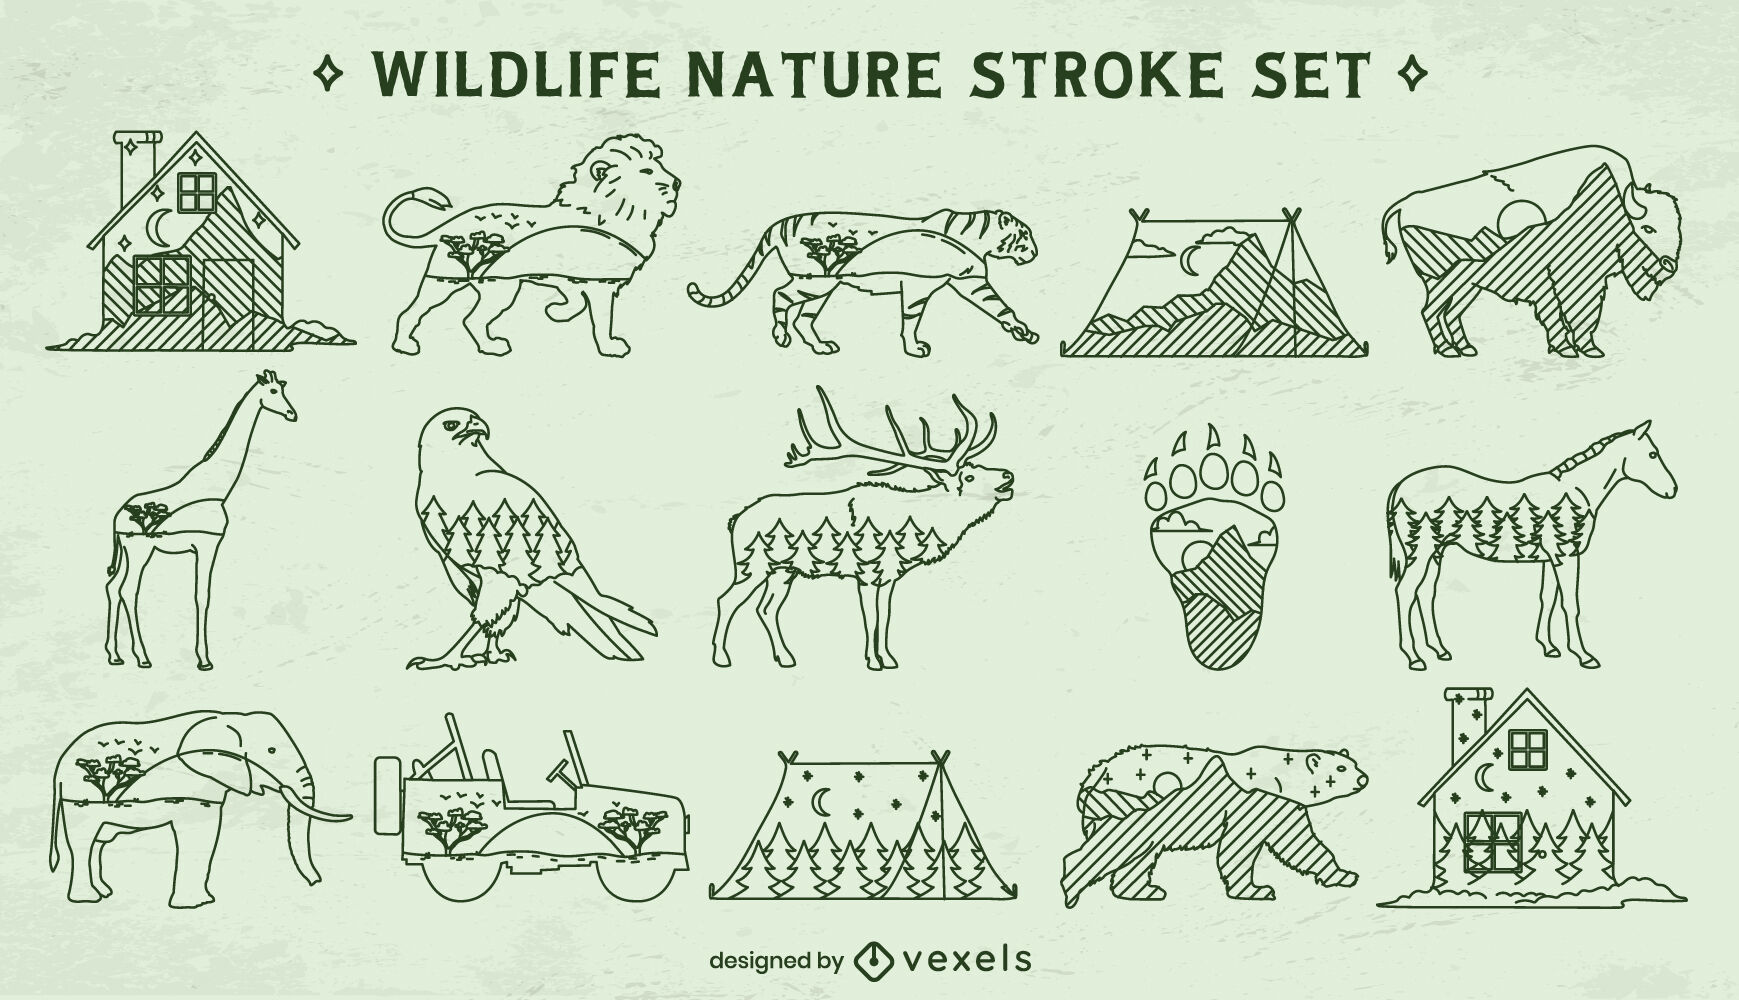 Elementos de trazo de doble exposición de vida silvestre.